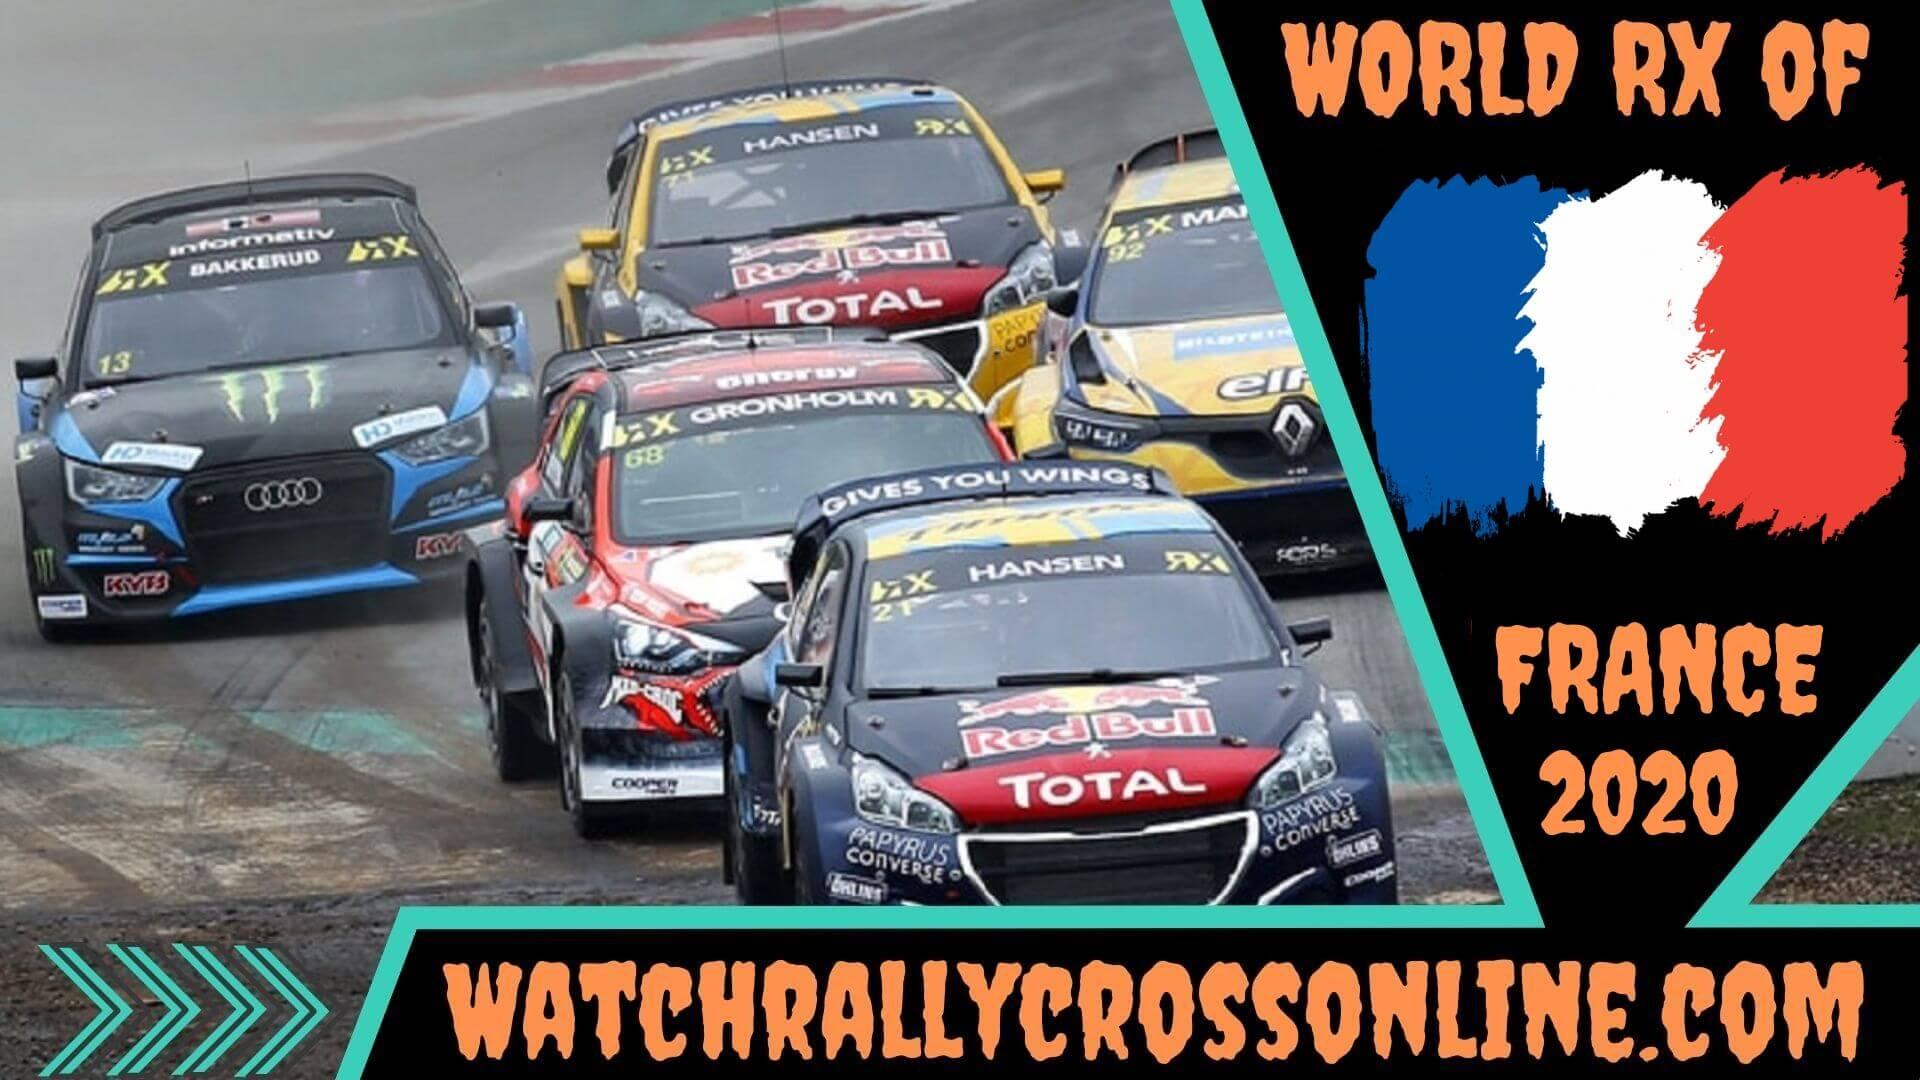 World Rallycross of France Live Stream 2020 | Round 8